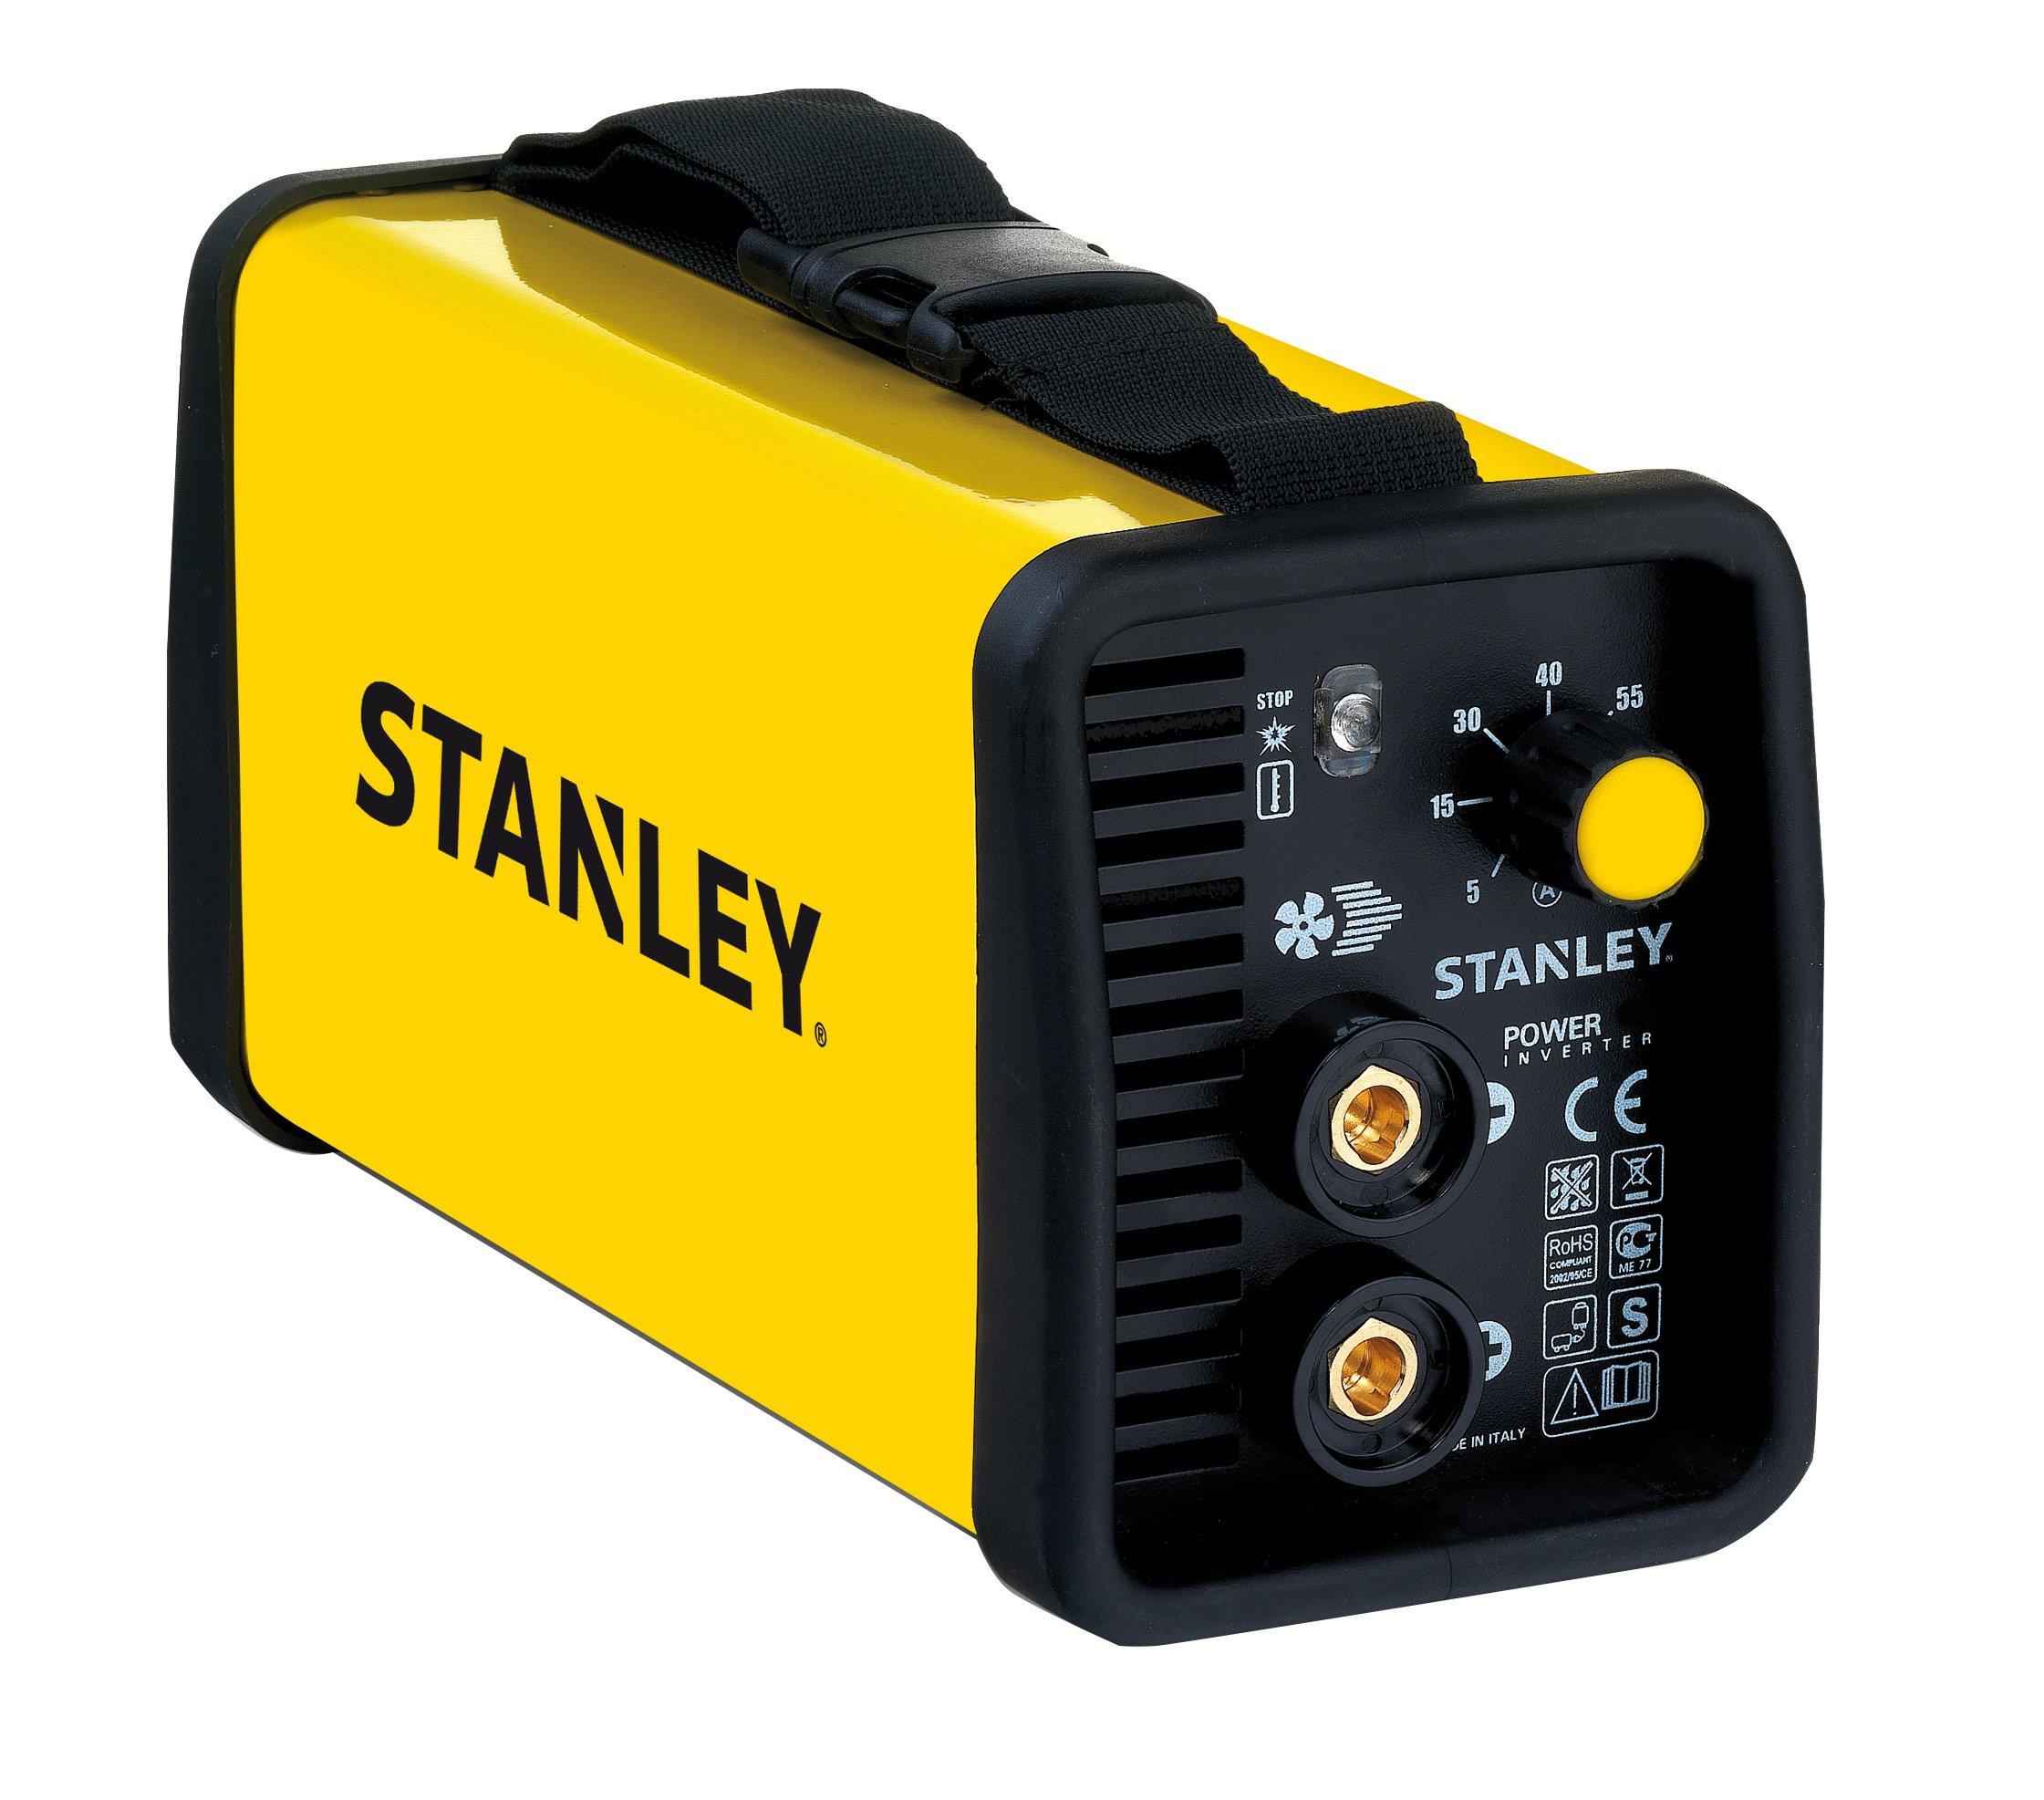 Stanley 460100 Inverter - Equipo de soldadura (90 A) product image